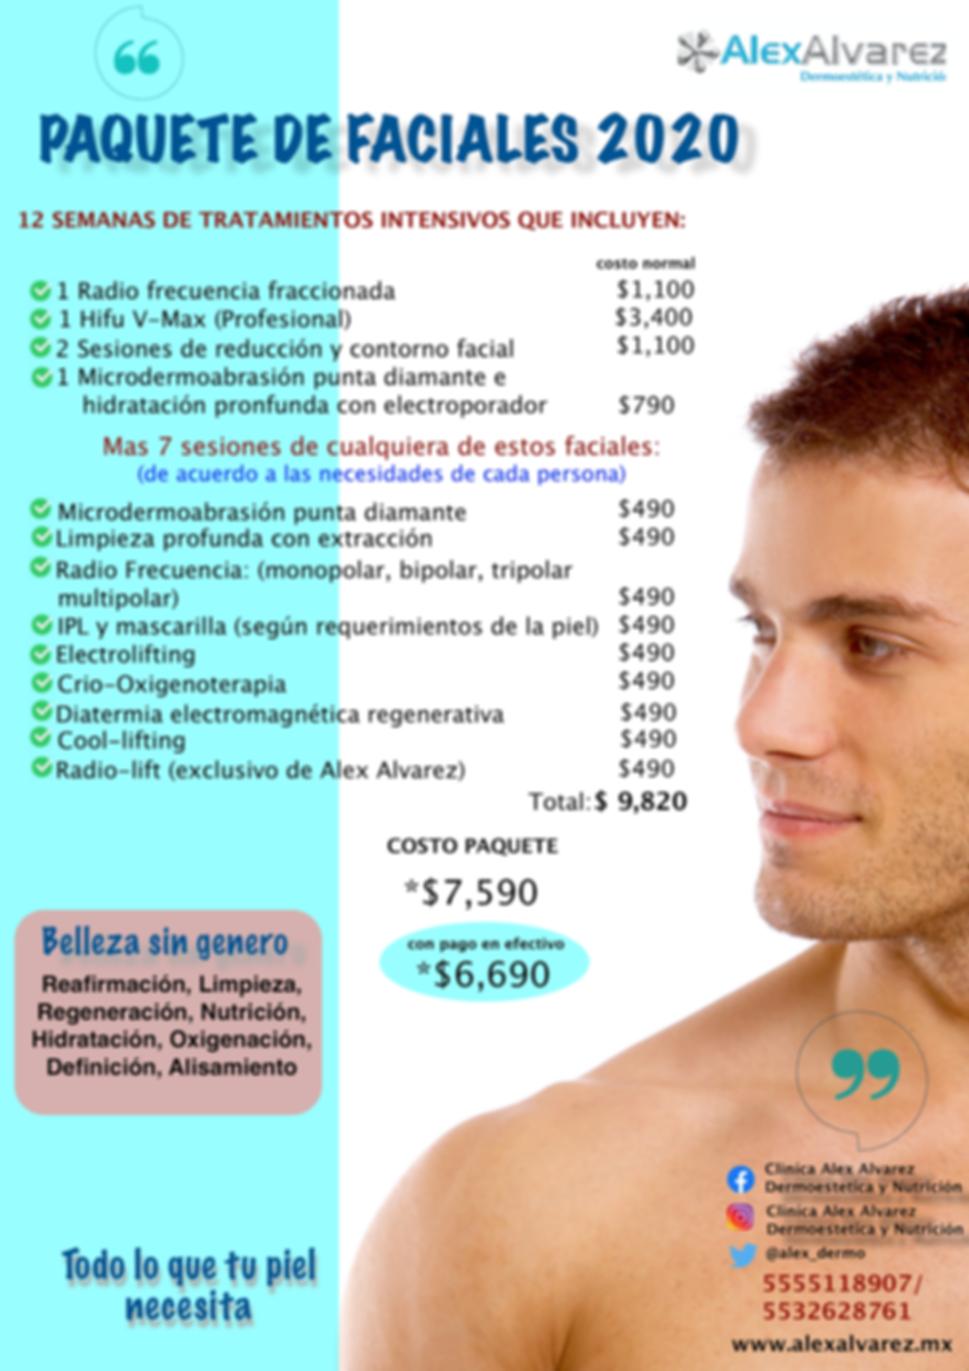 PAQUETE DE FACIALES 2020 HD.png